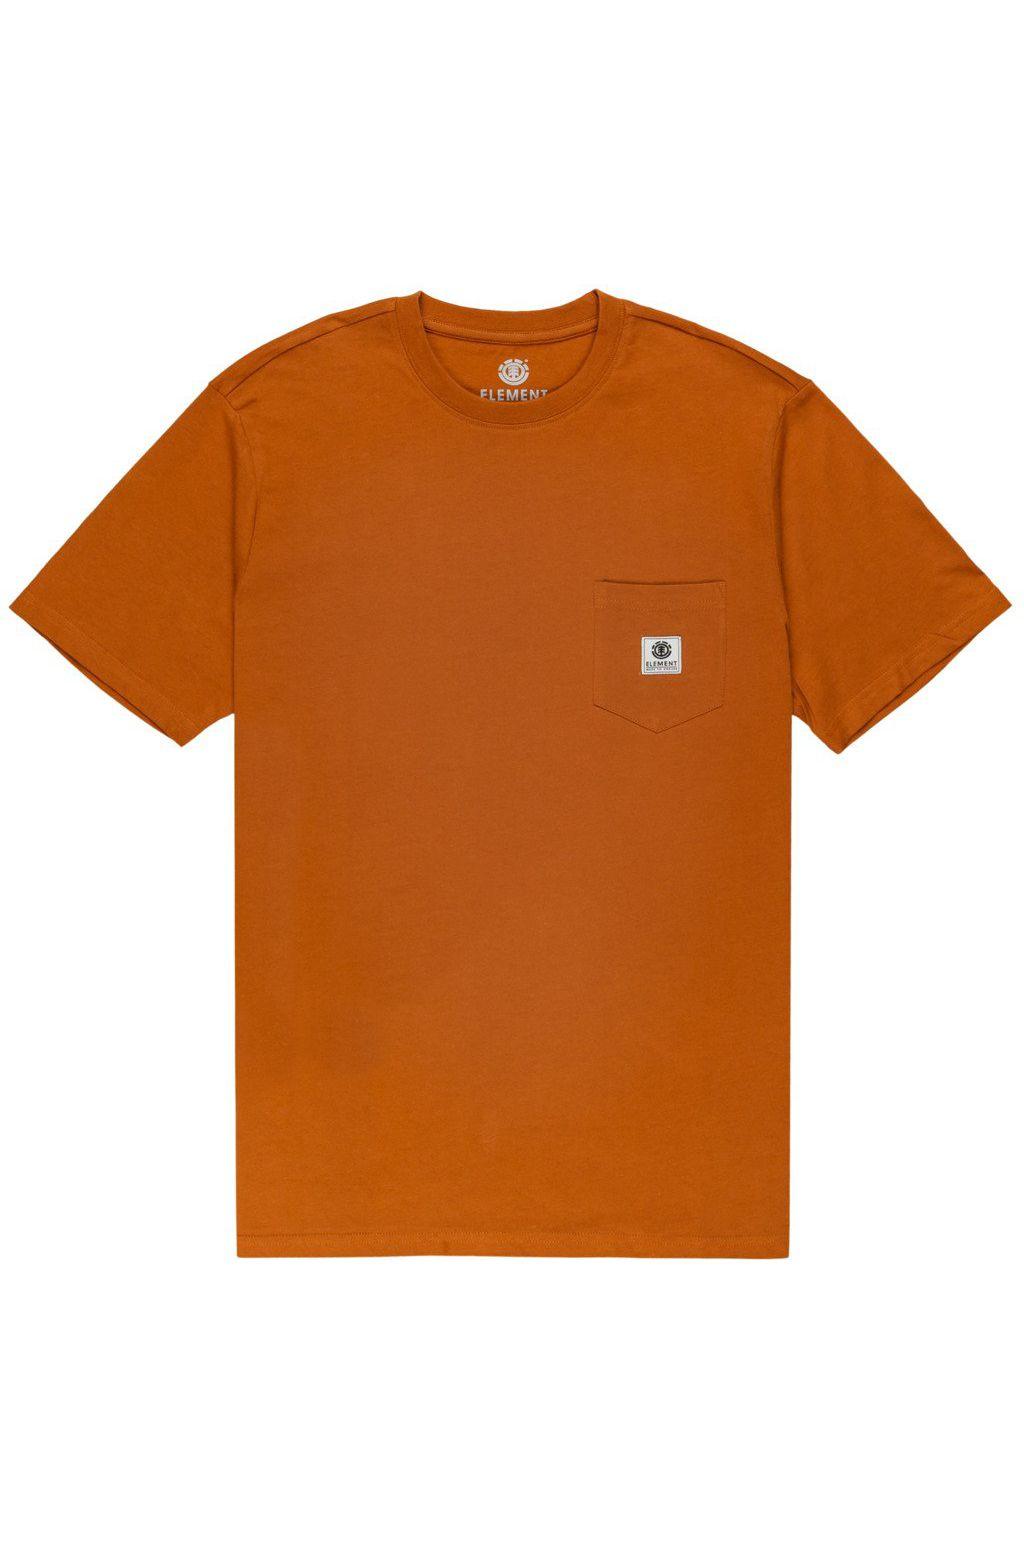 T-Shirt Element BASIC POCKET LABEL Glazed Ginger